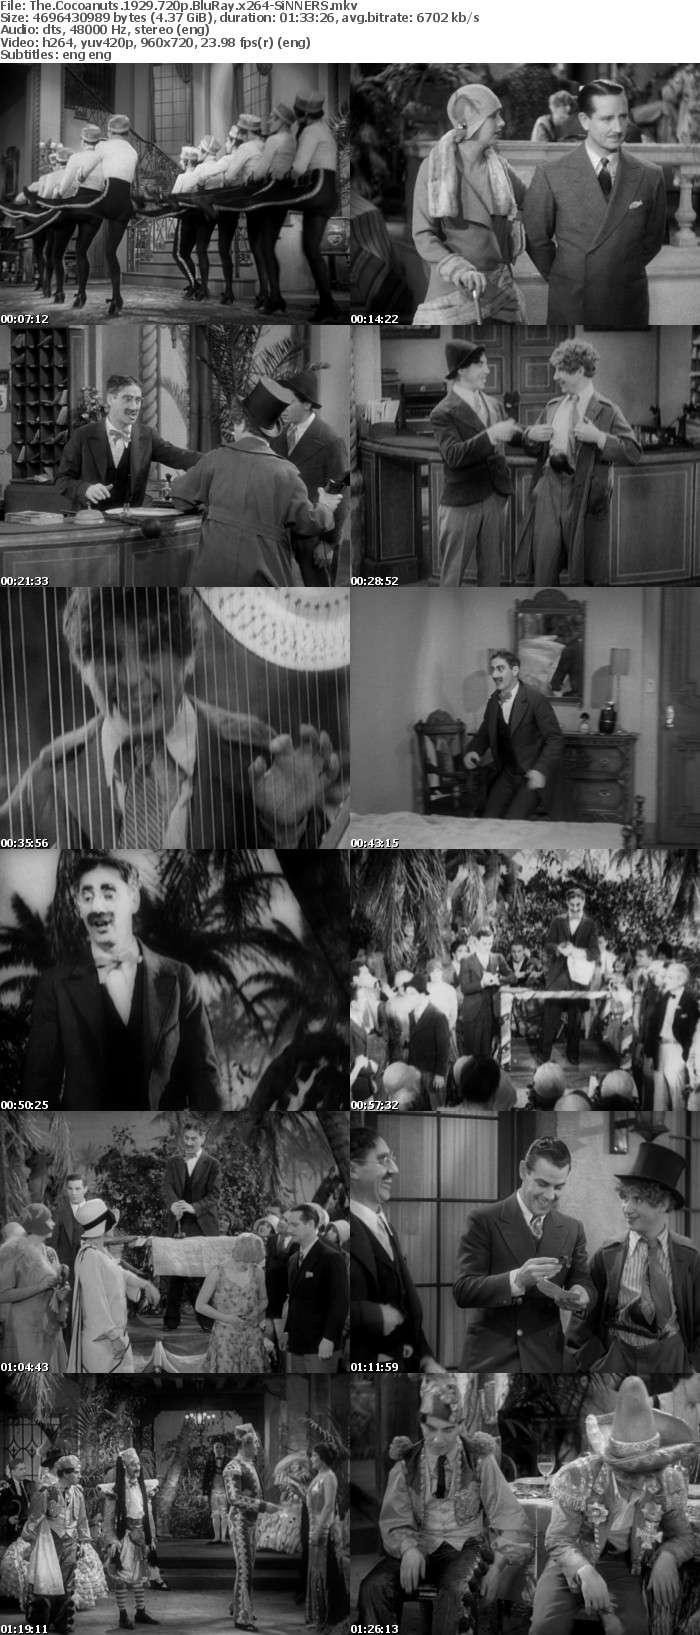 The Cocoanuts 1929 720p BluRay x264-SiNNERS